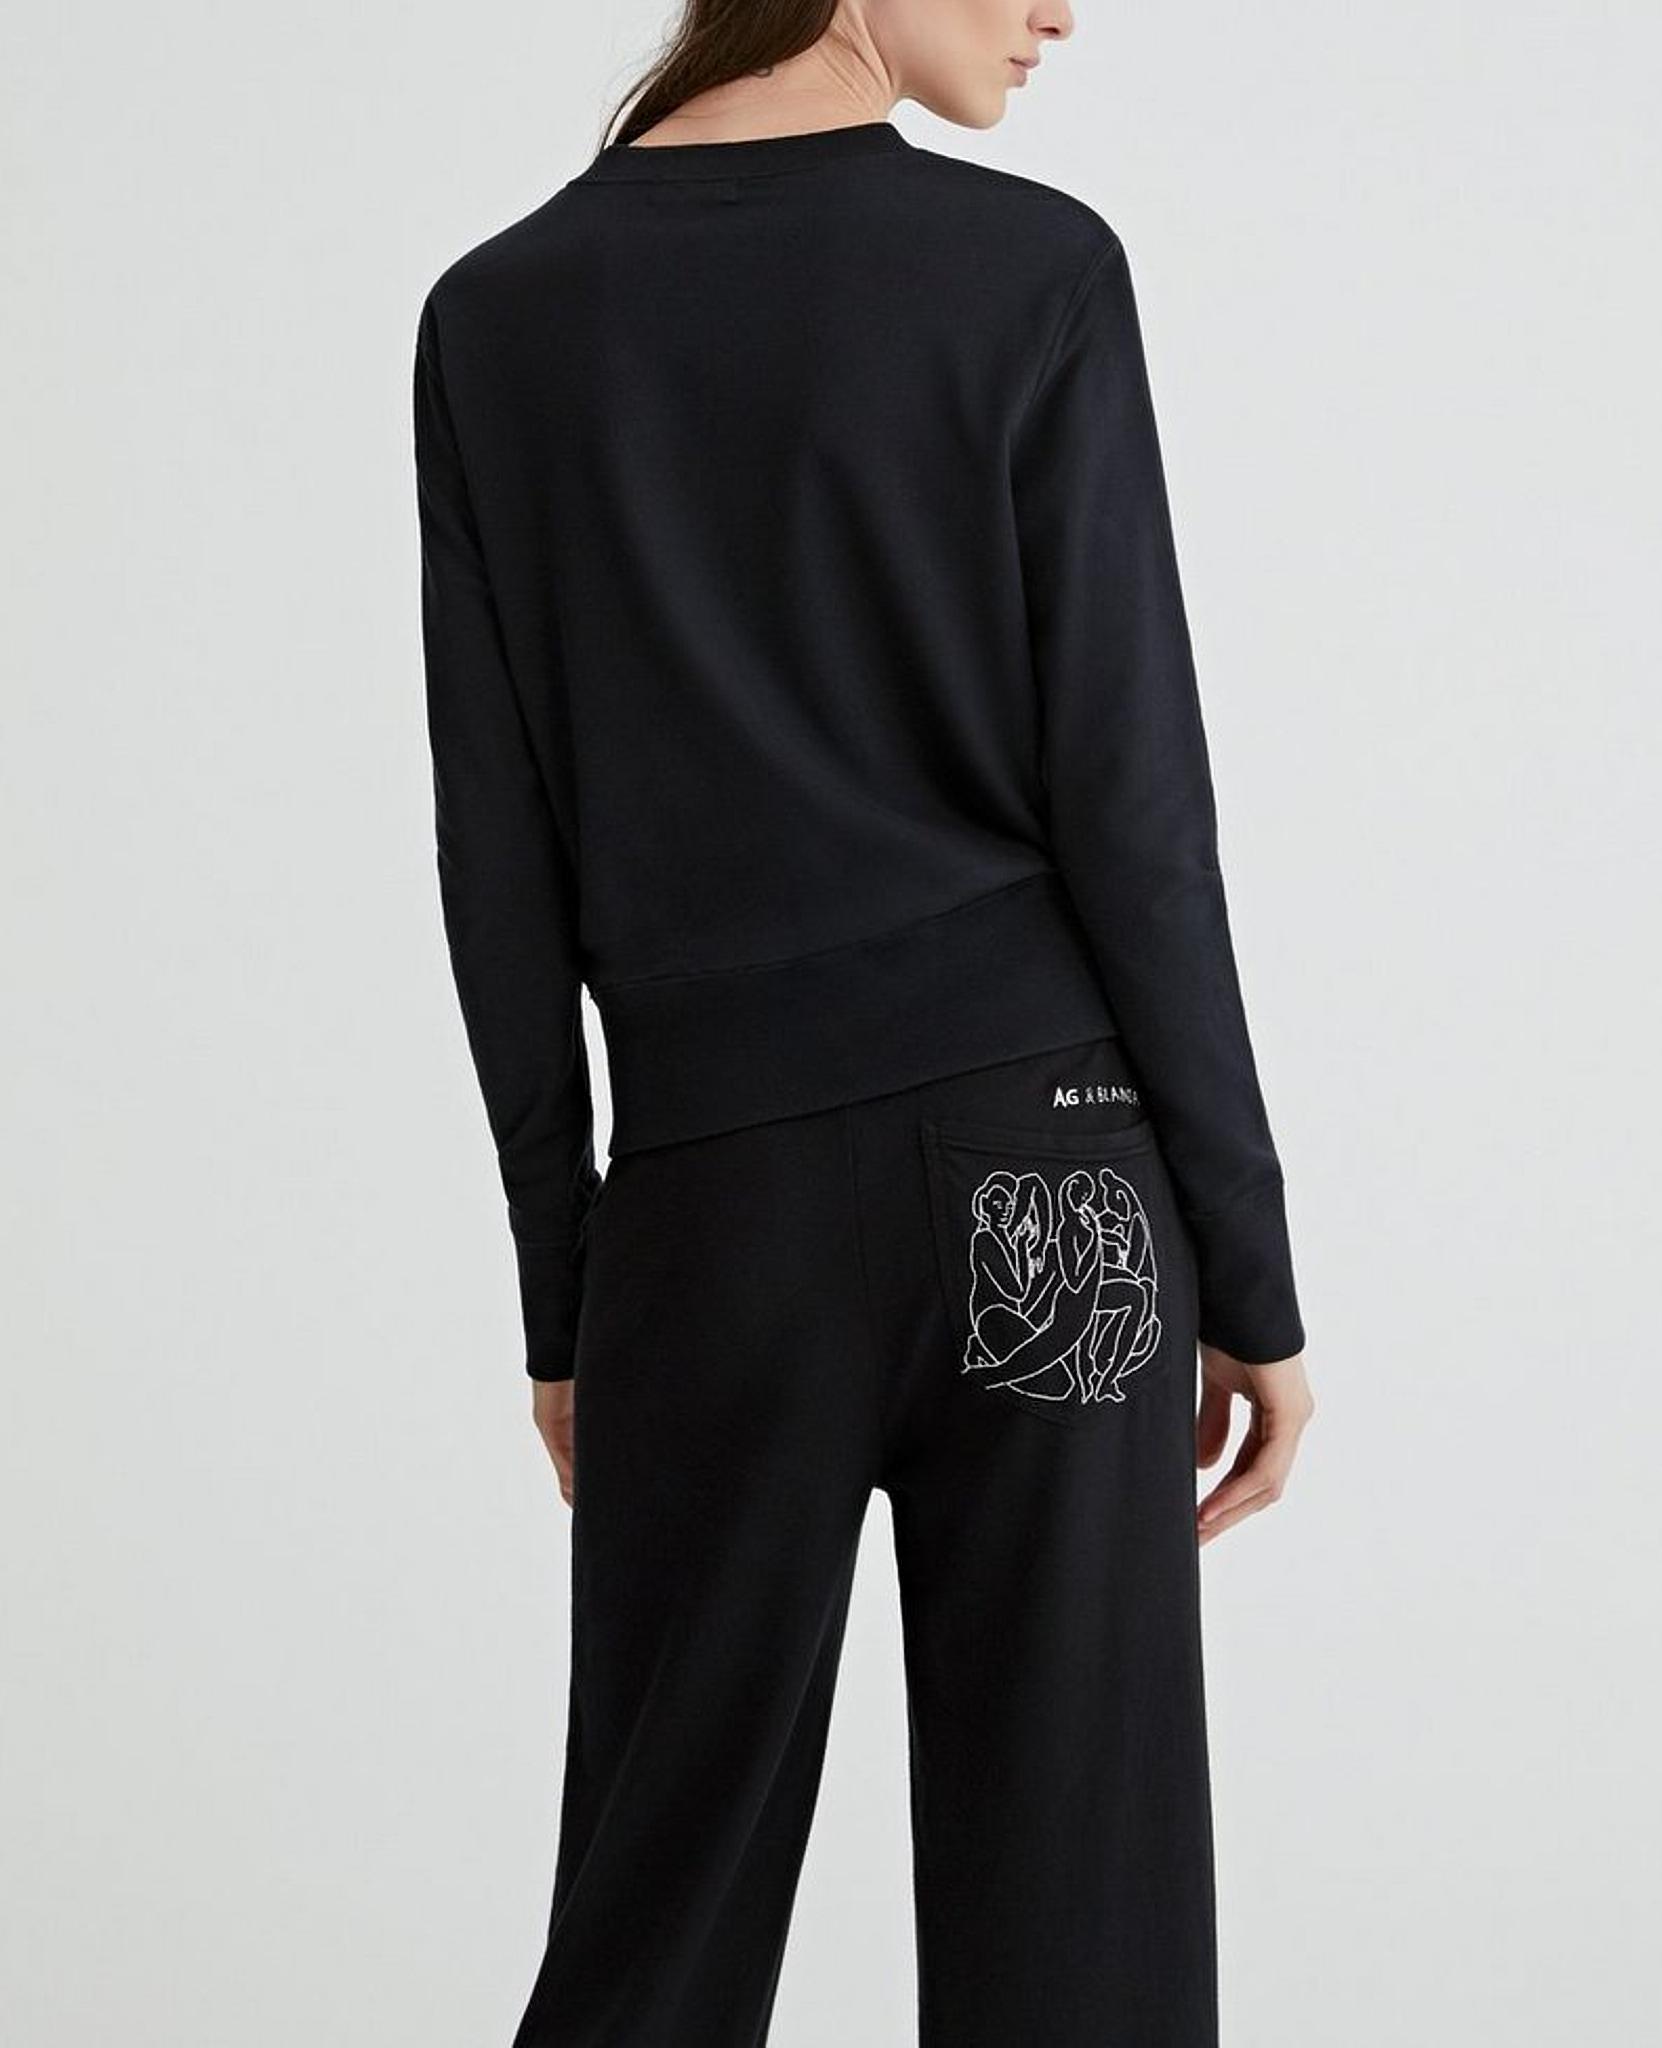 The Rae Sweatshirt